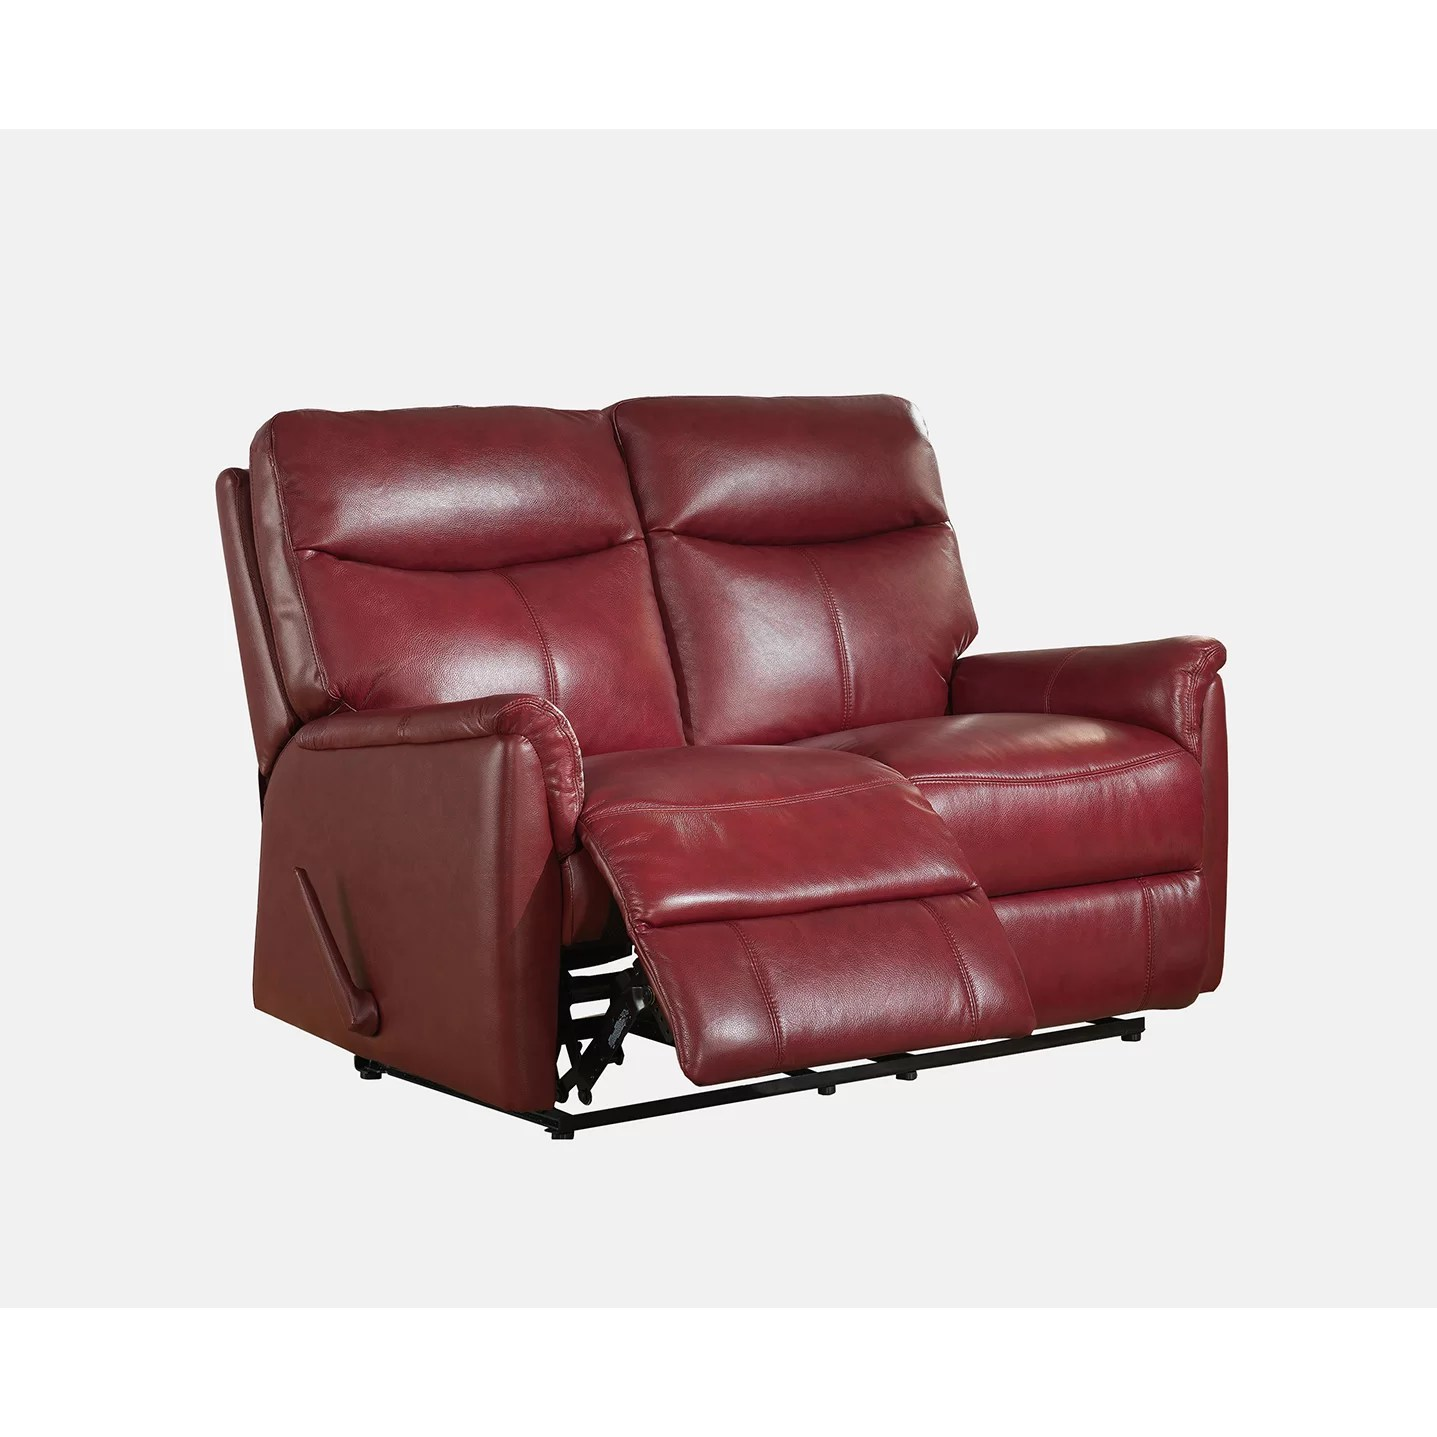 Leather Living Room Sets Recliner